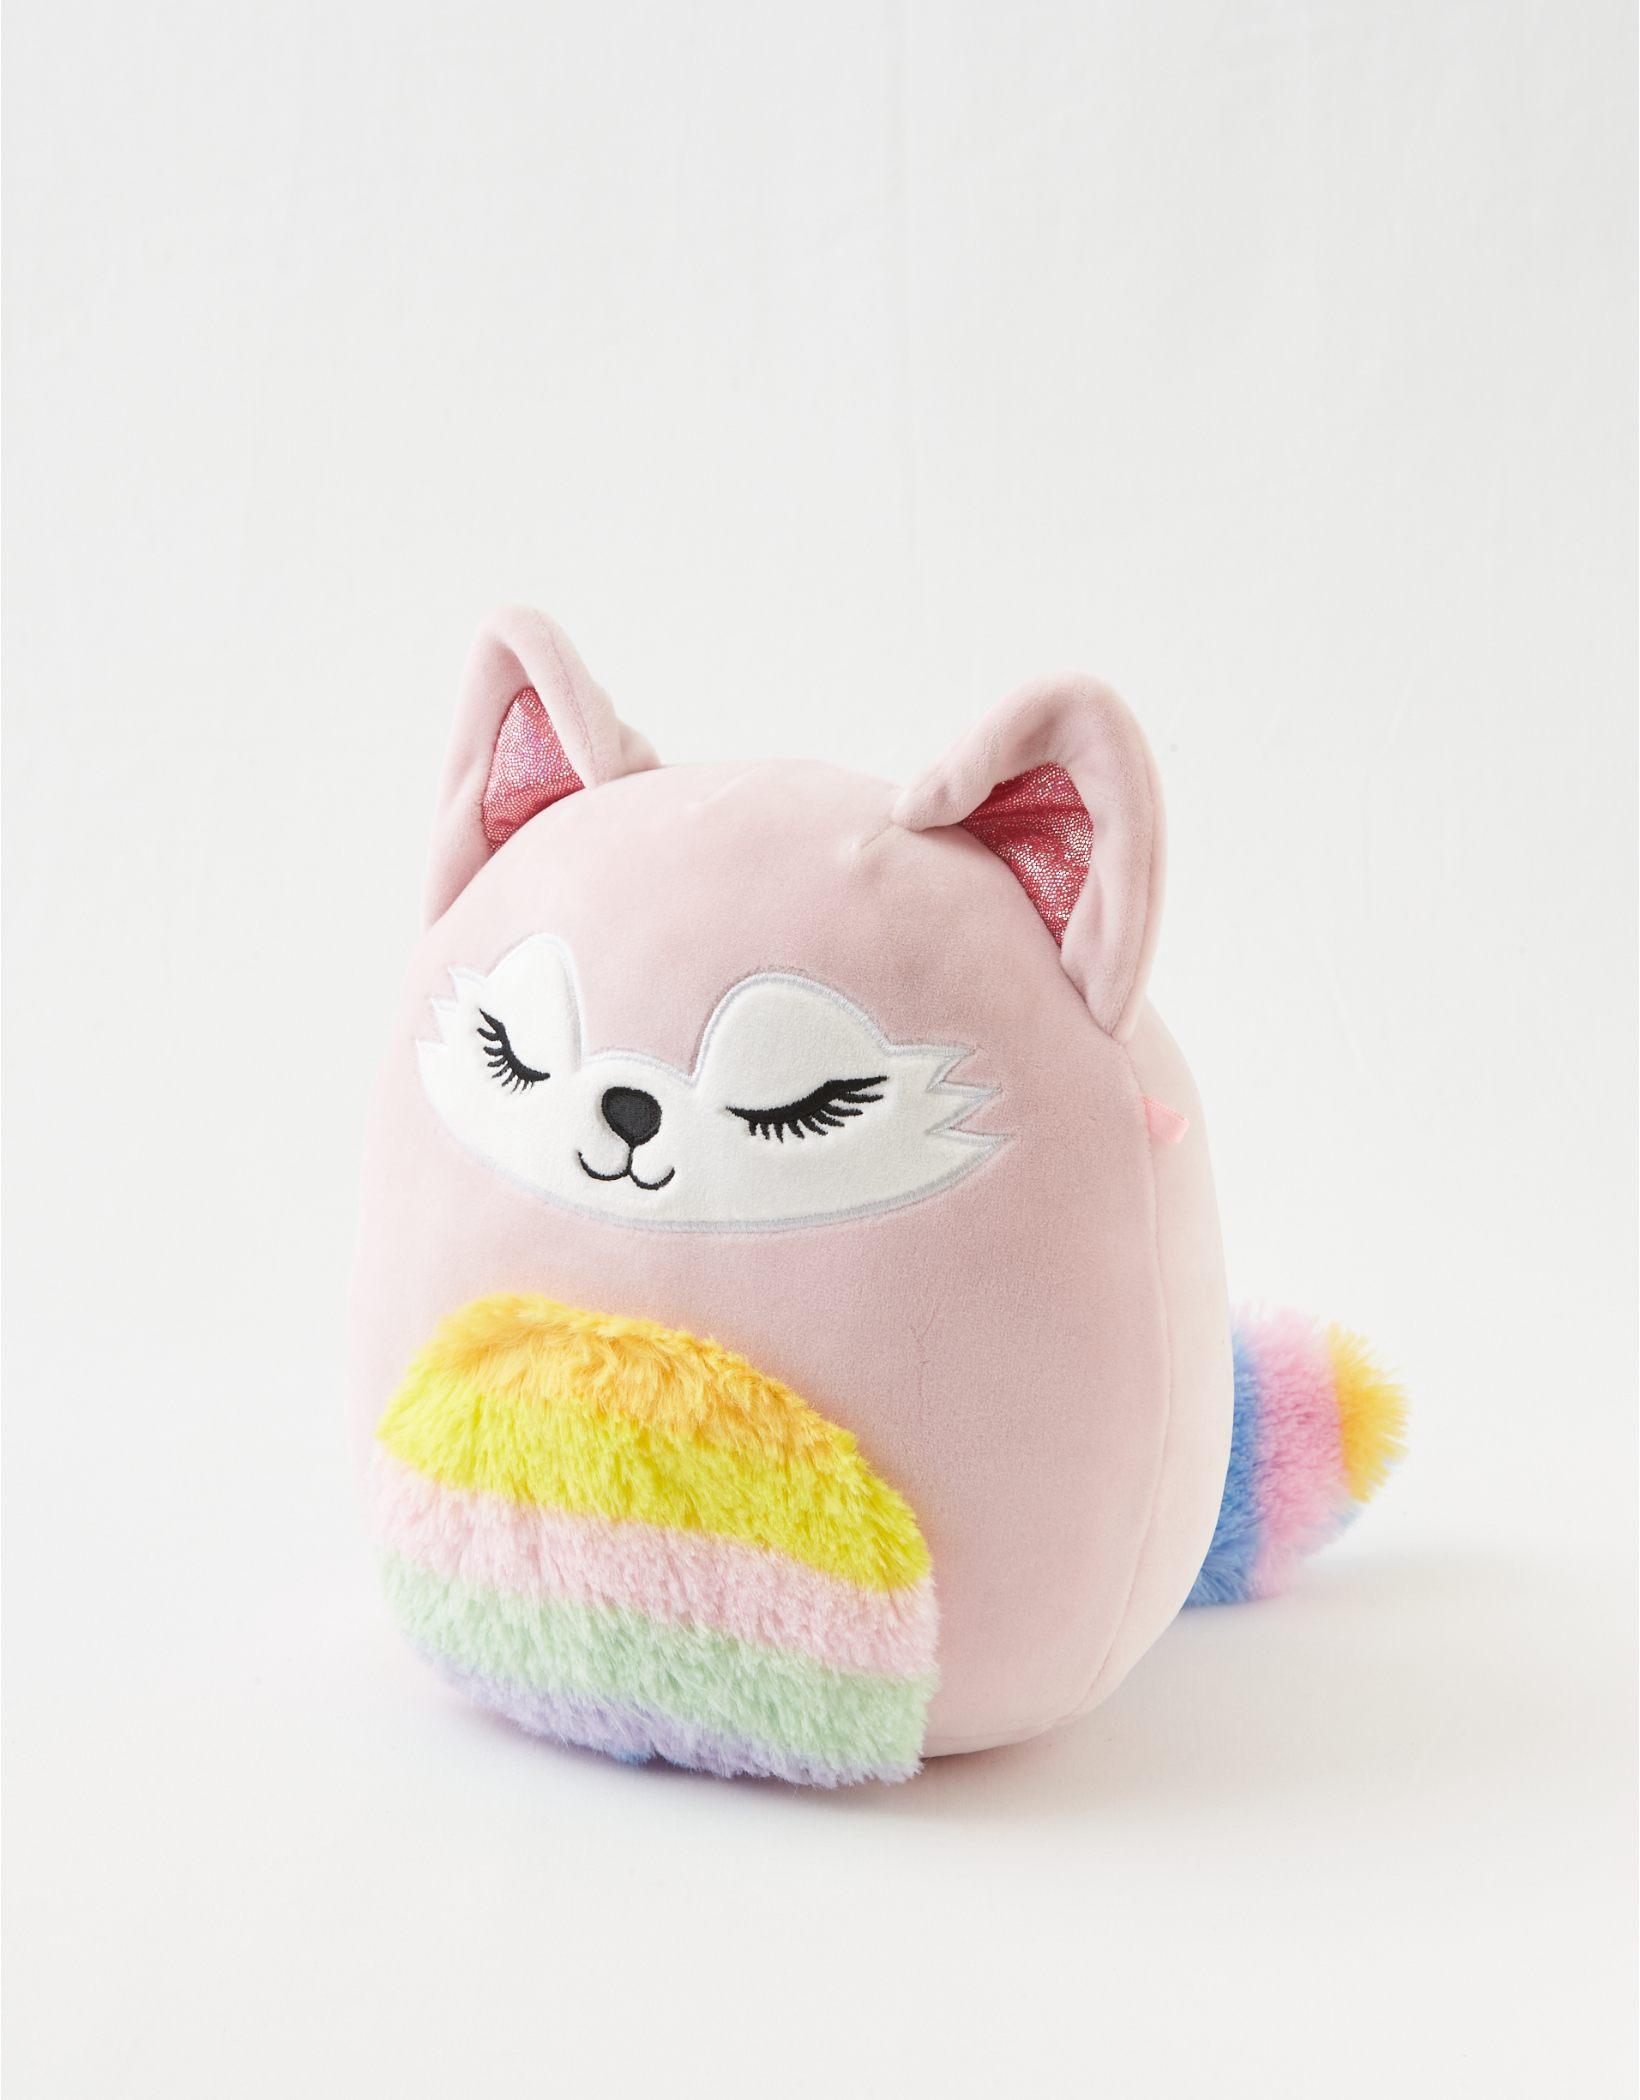 Squishmallow 8 in Plush Toy - Alessi